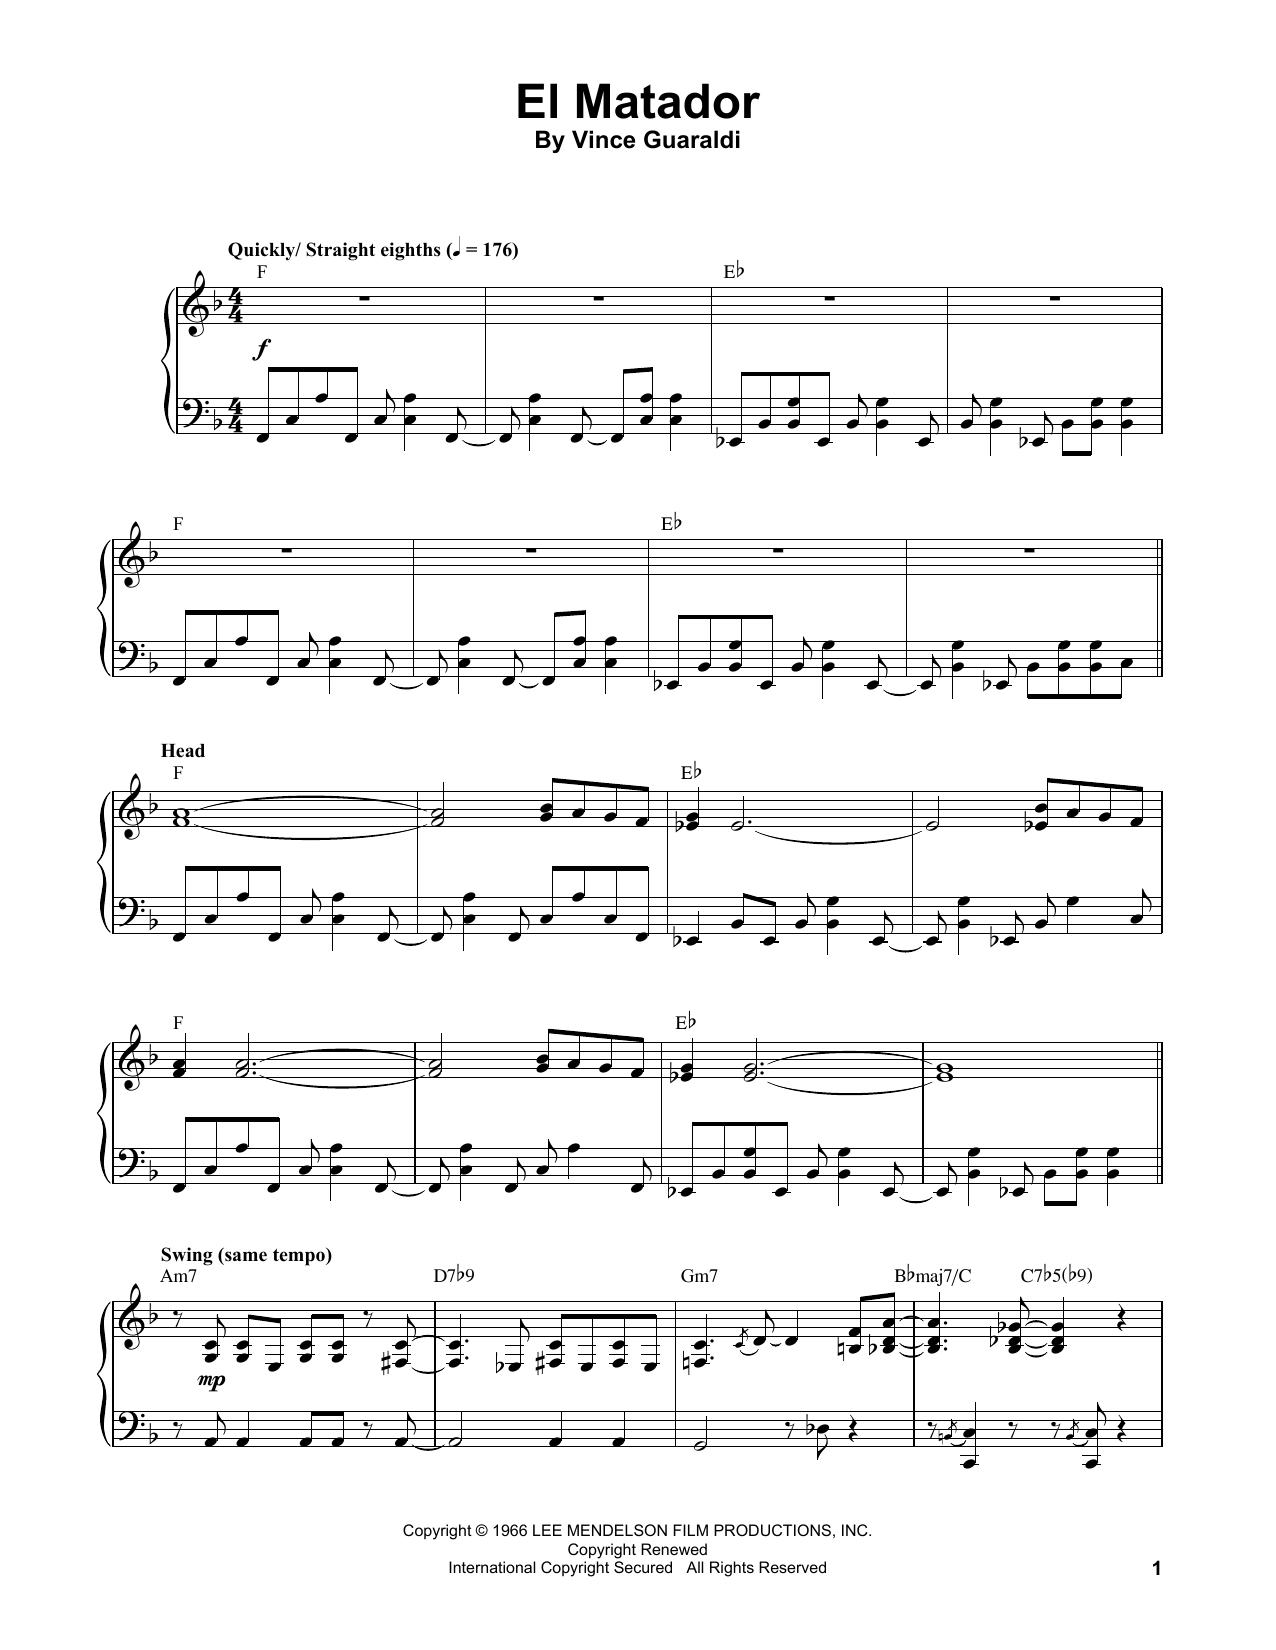 Vince Guaraldi El Matador sheet music notes and chords